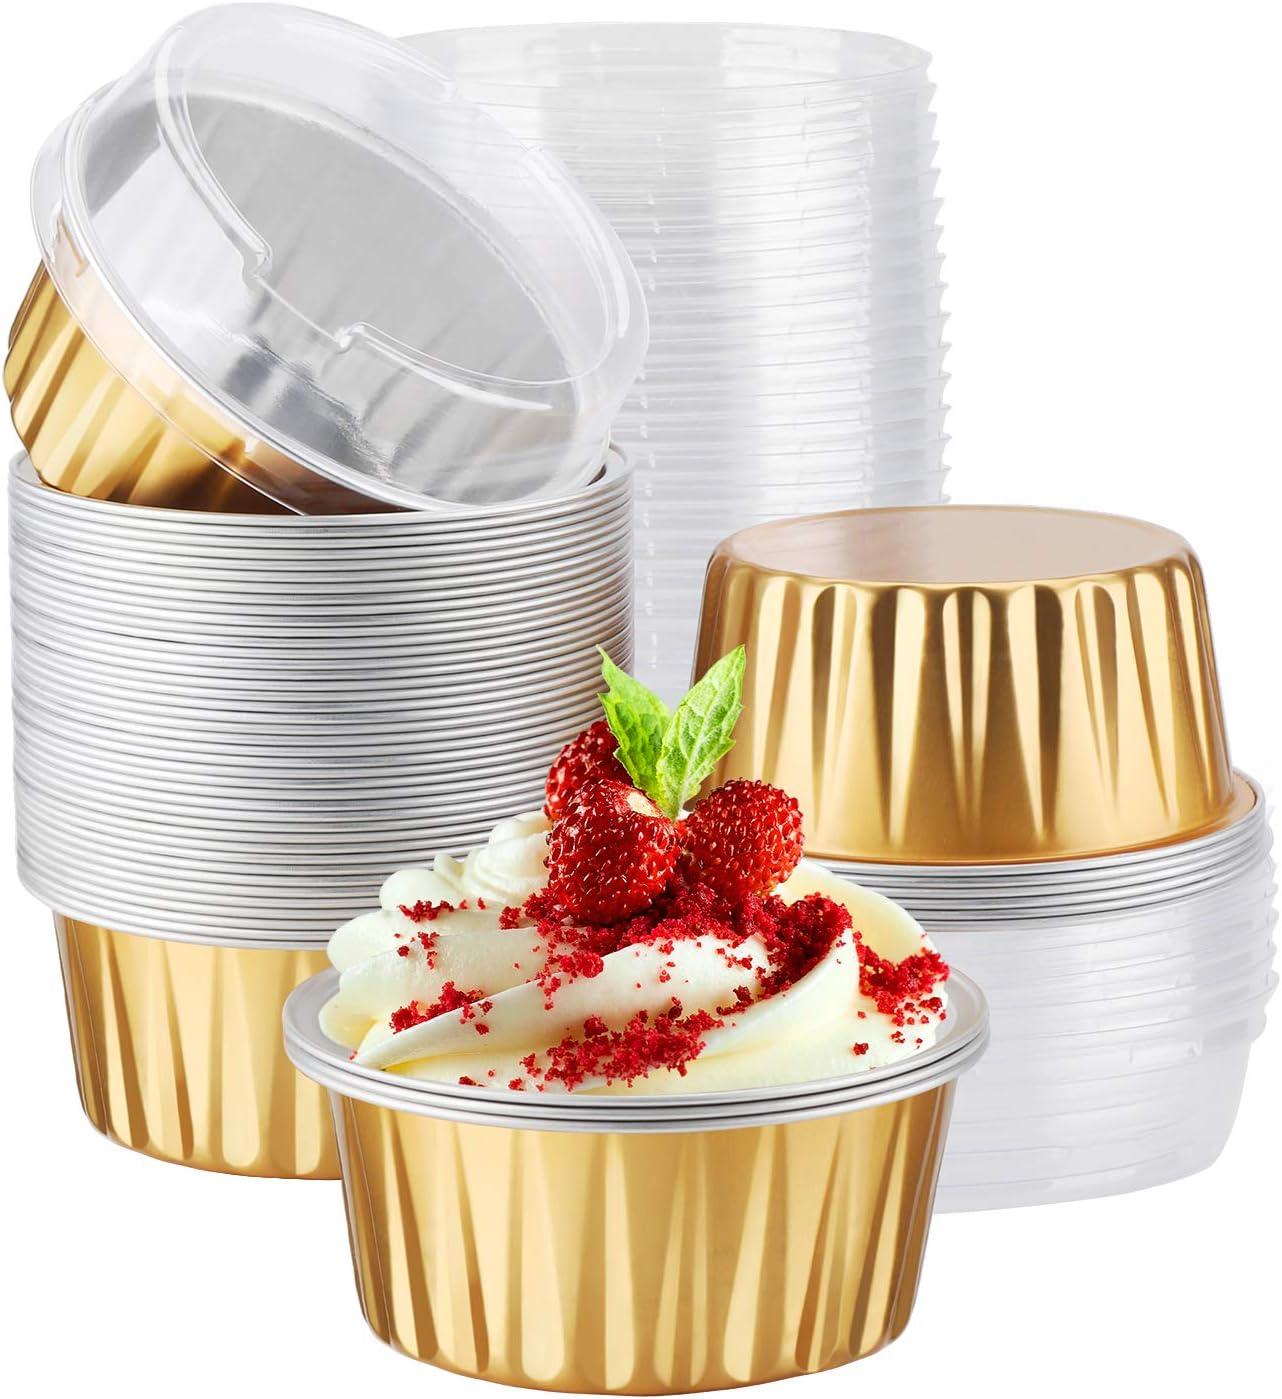 Aluminum Cupcake liners, Eusoar 50pcs 5oz 125ml Muffin Liners Cups with Lids, Disposable Foil Ramekins, Aluminum Foil Baking Cups, Cupcake Baking Cups, Aluminum Foil Cupcake Holders Pans